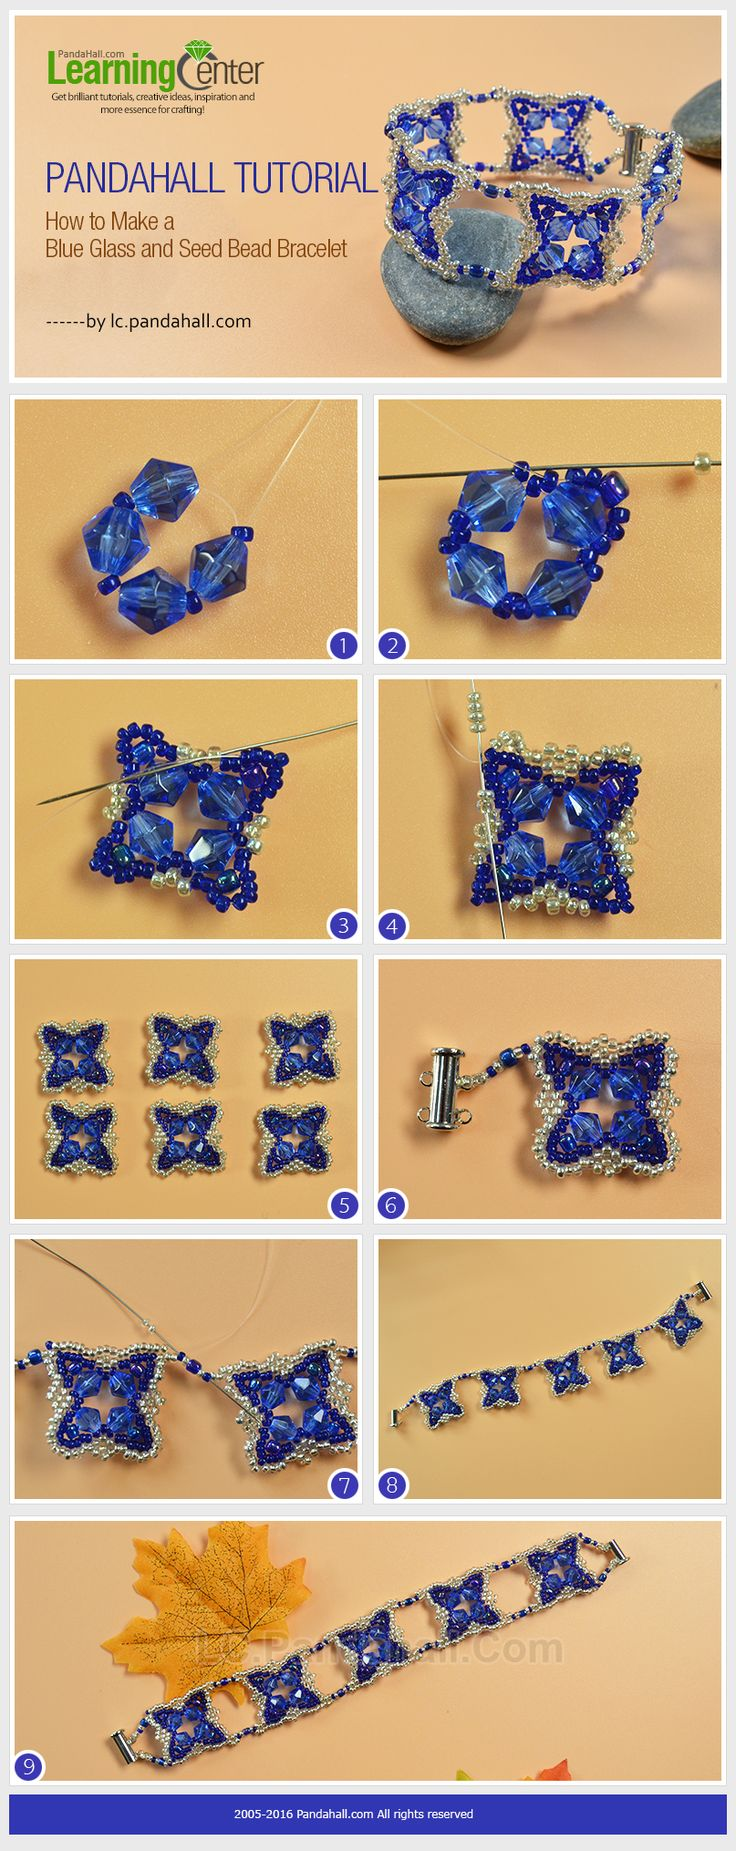 Pandahall Tutorial on How to Make a Blue Glass and Seed Bead Bracelet from LC.Pandahall.com